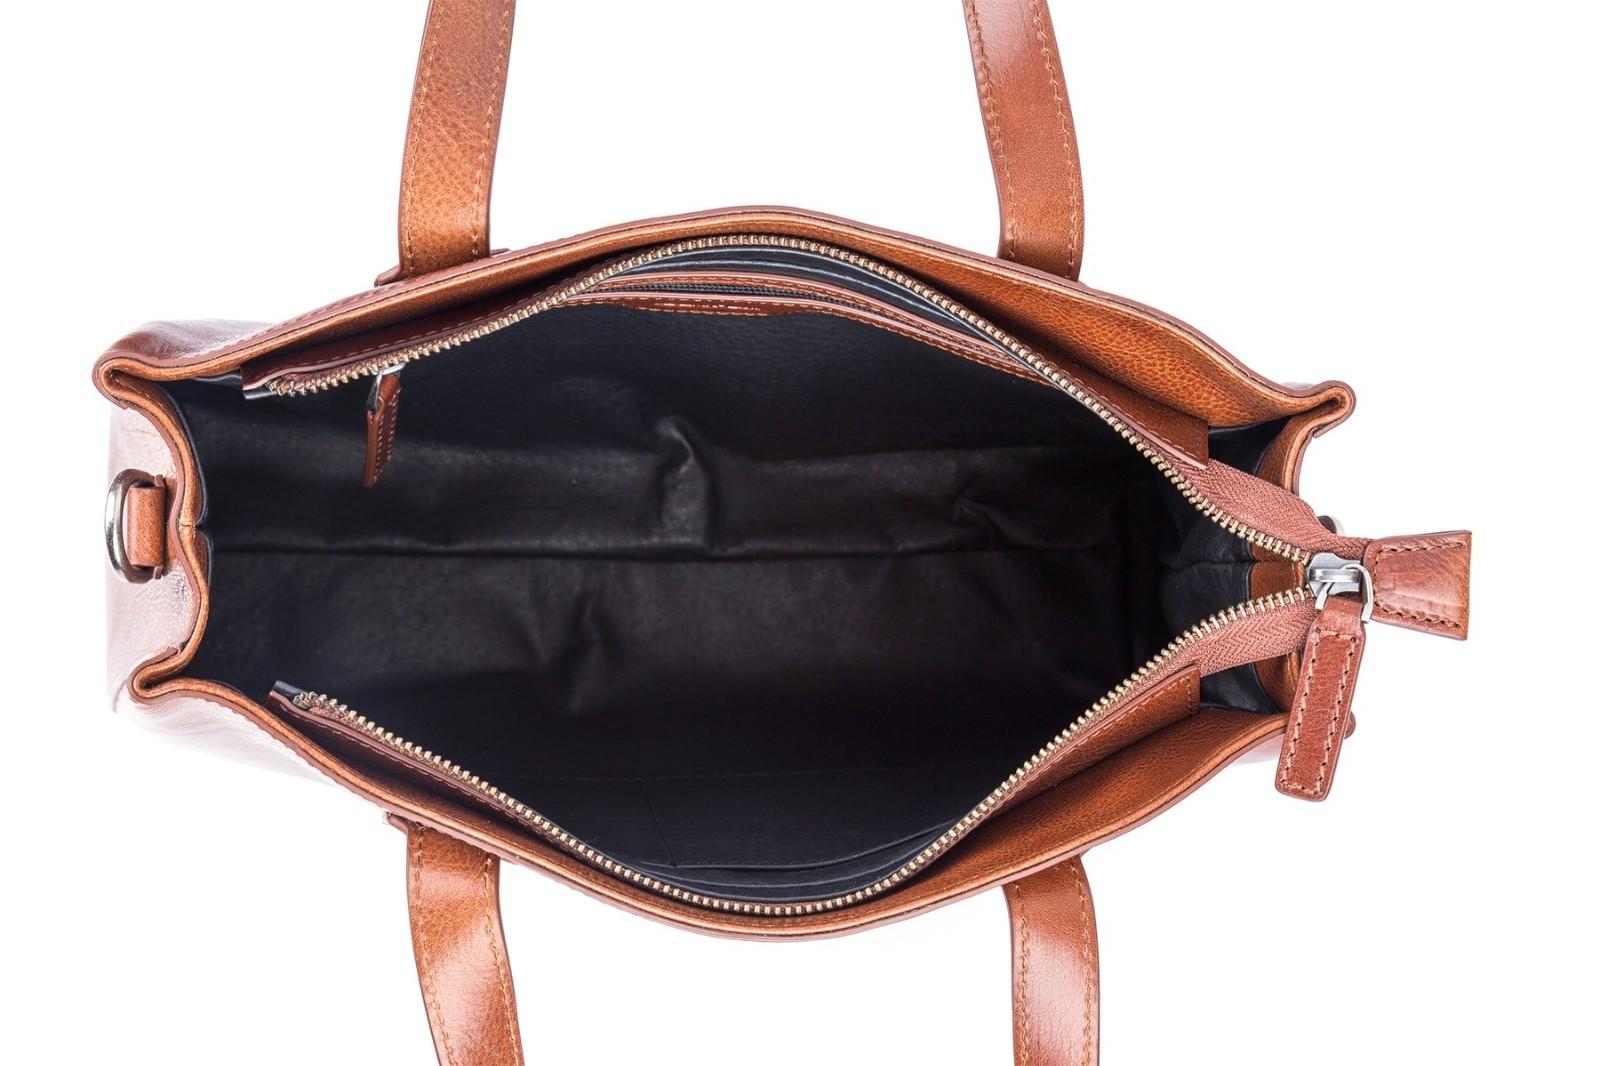 GF bags-Latest Handbags | Handbag Top Handle Waxed Leather Zipper Close Bag - Gaofeng-9